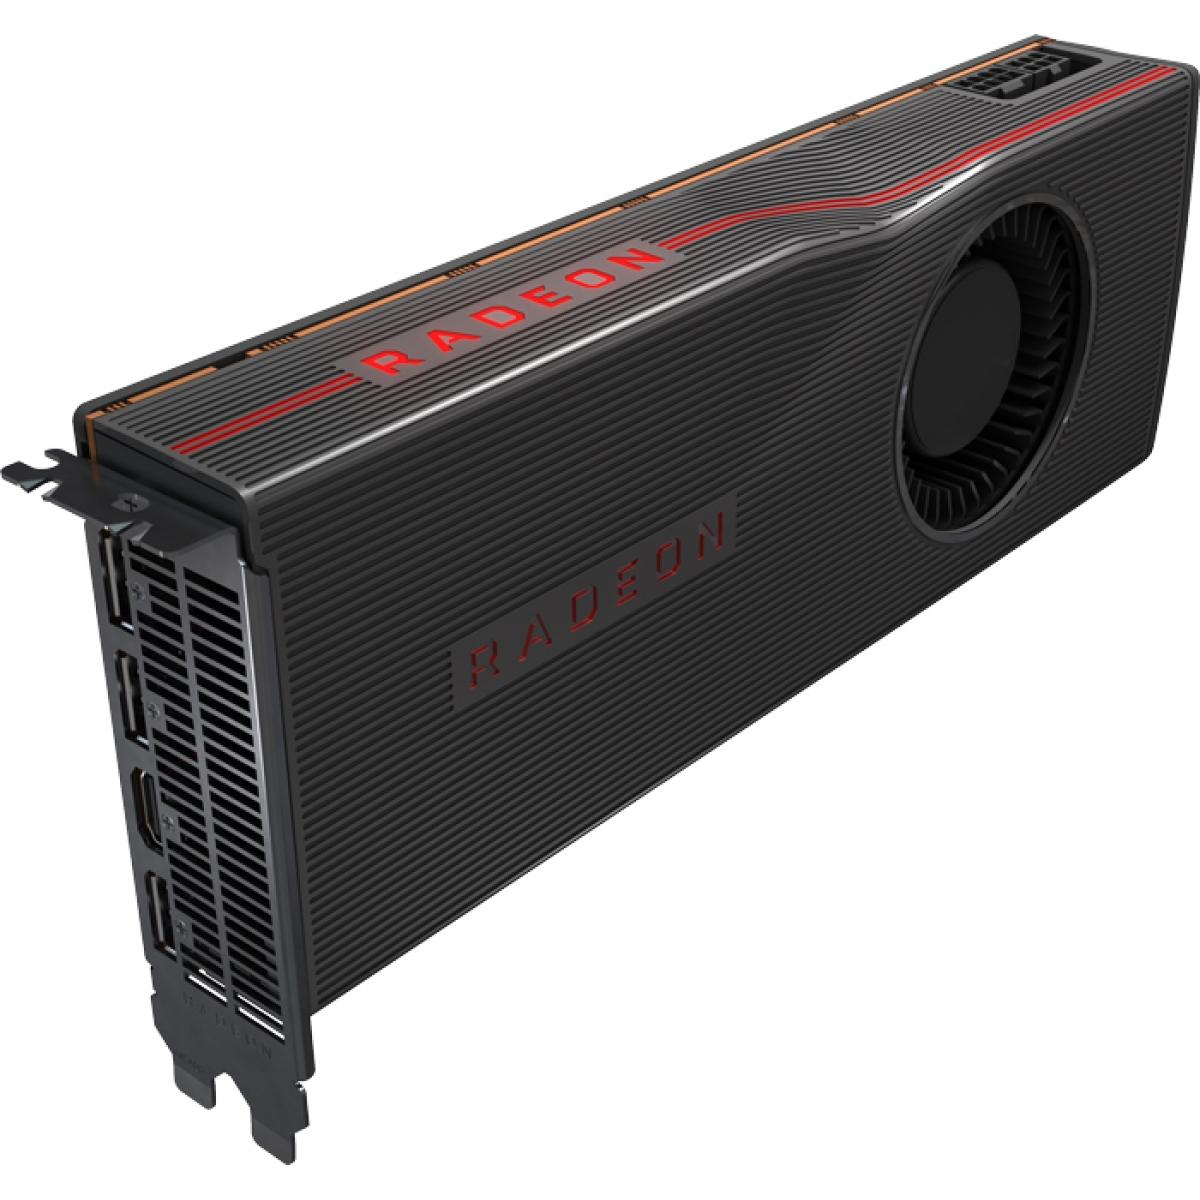 Placa de Vídeo XFX Radeon Navi RX 5700 XT D6, 8GB GDDR6, 256Bit, RX-57XT8MFD6